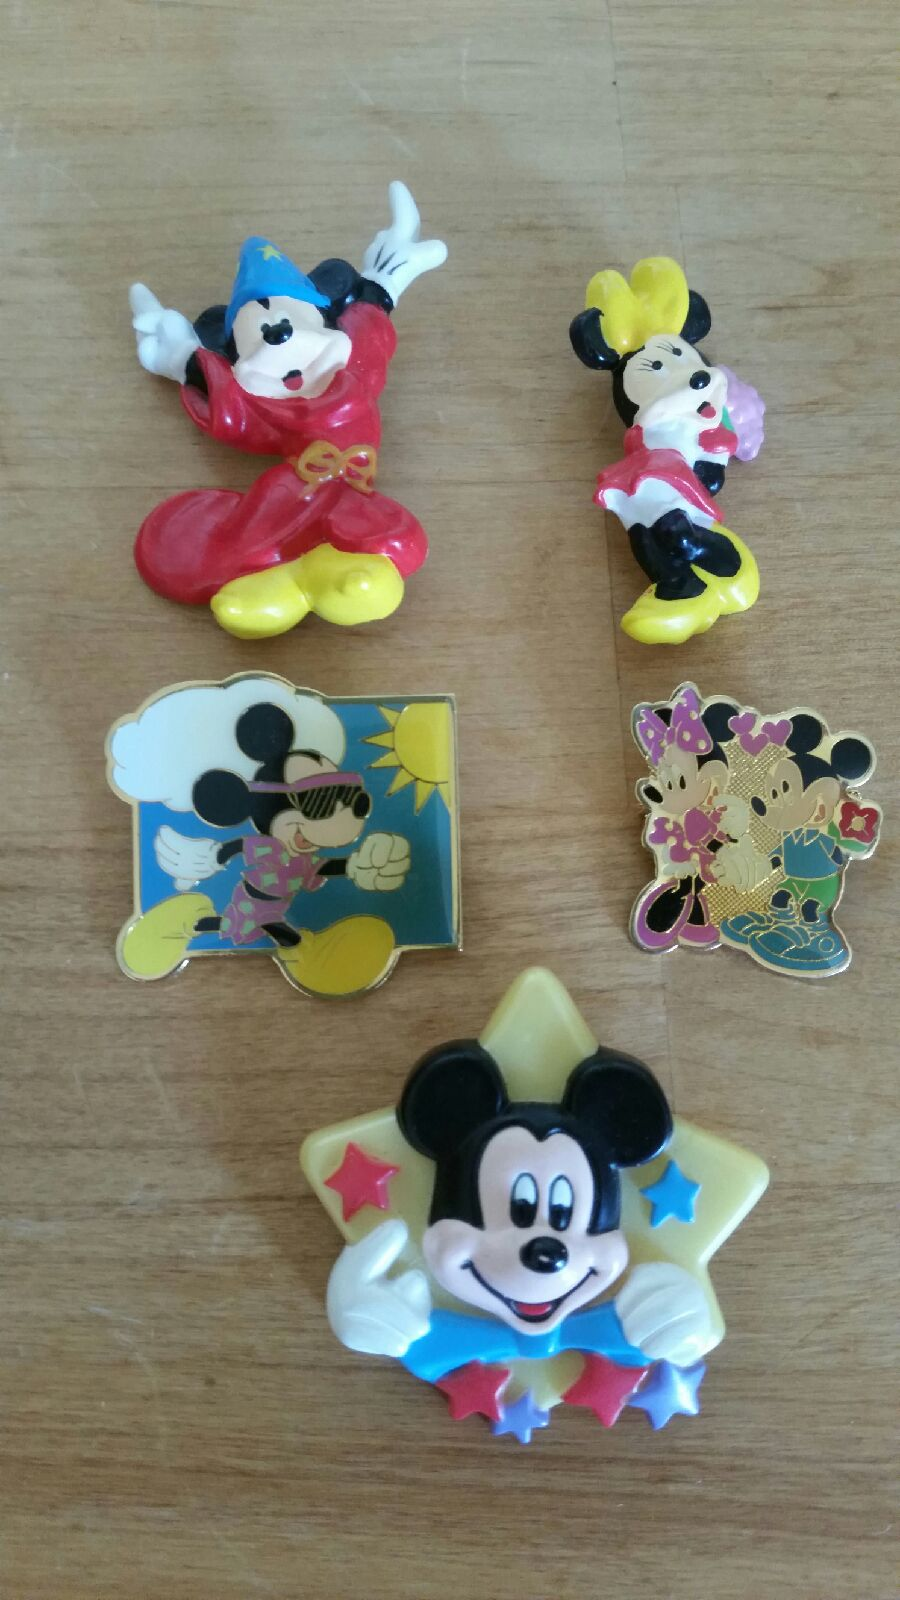 Disney Mickey and Minnie pins